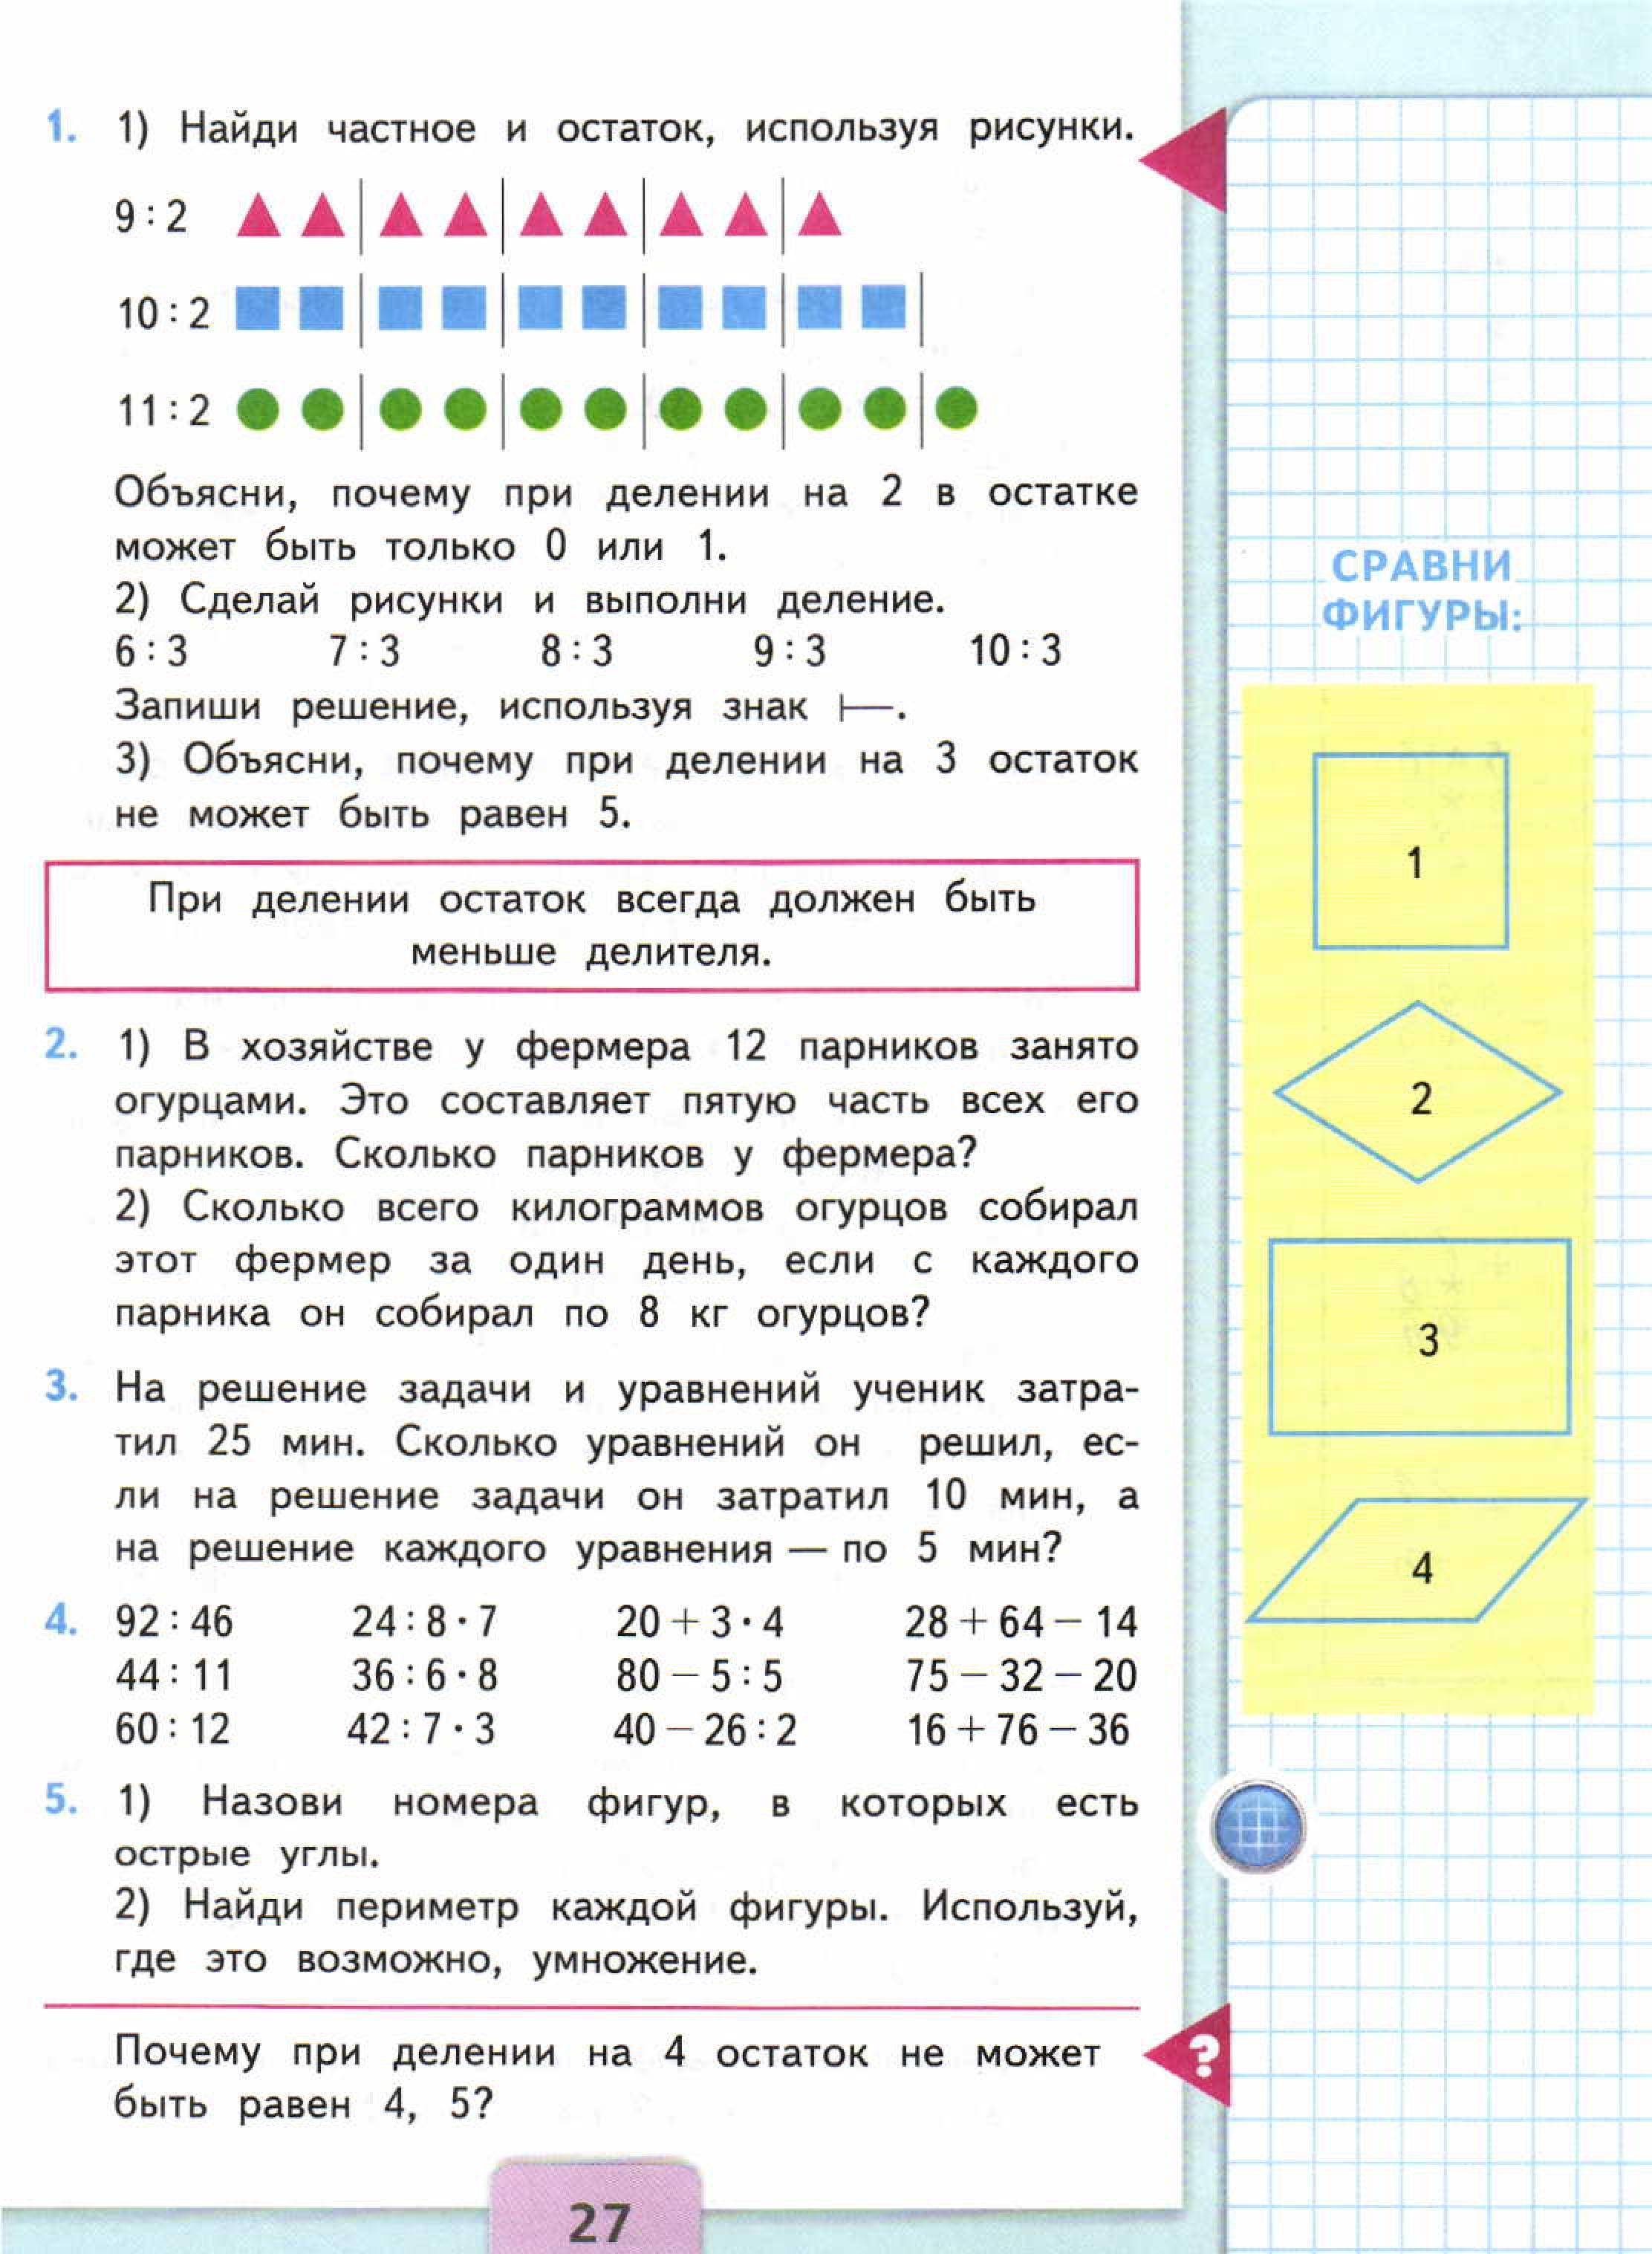 Спиши ру класс 3 математика задания на смекалку видео